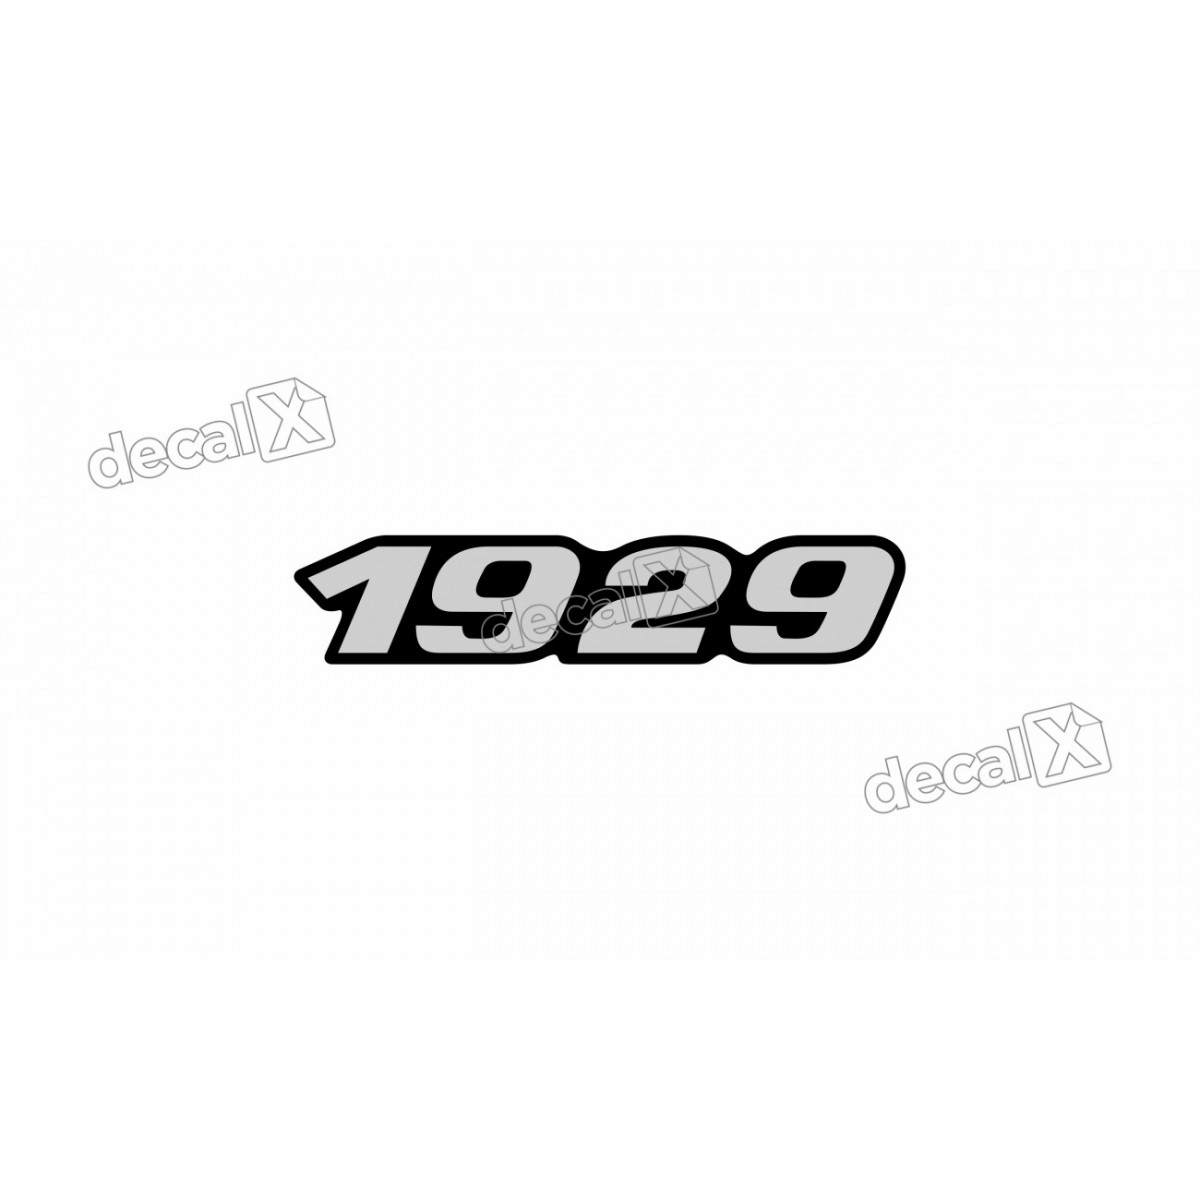 Adesivo Emblema Resinado Mercedes 1929 Cm66 Decalx